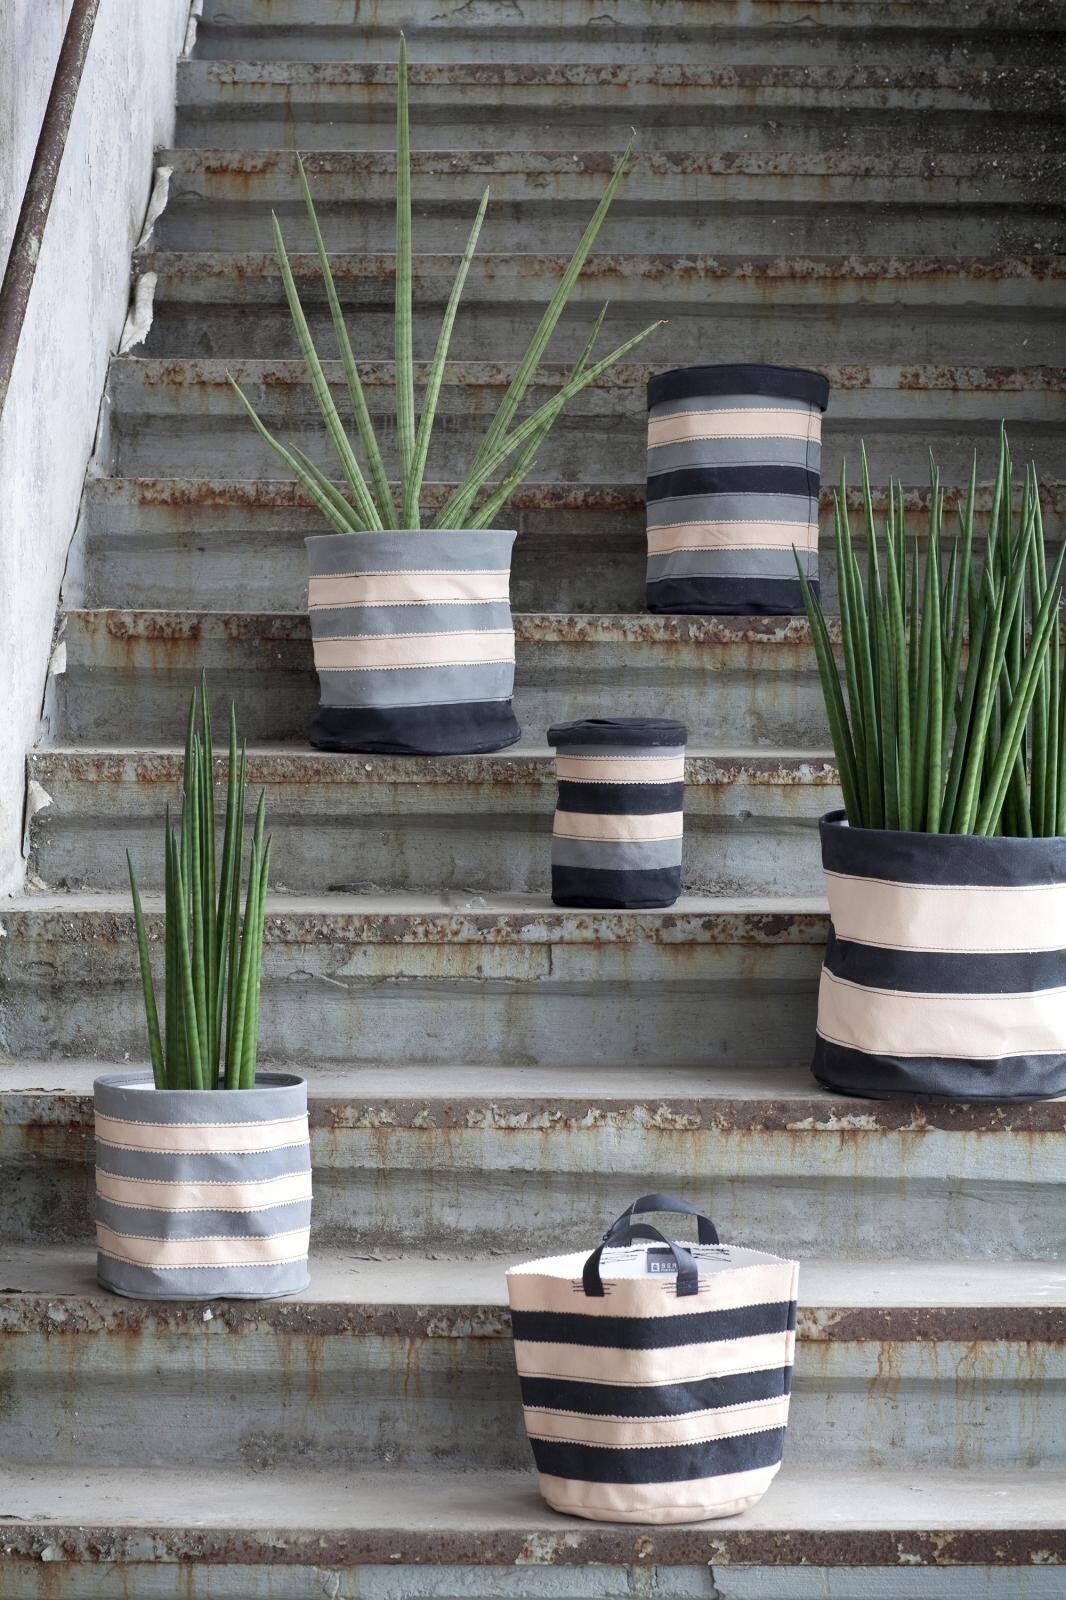 Serax - Flower pots can transform any garden or interior (3)